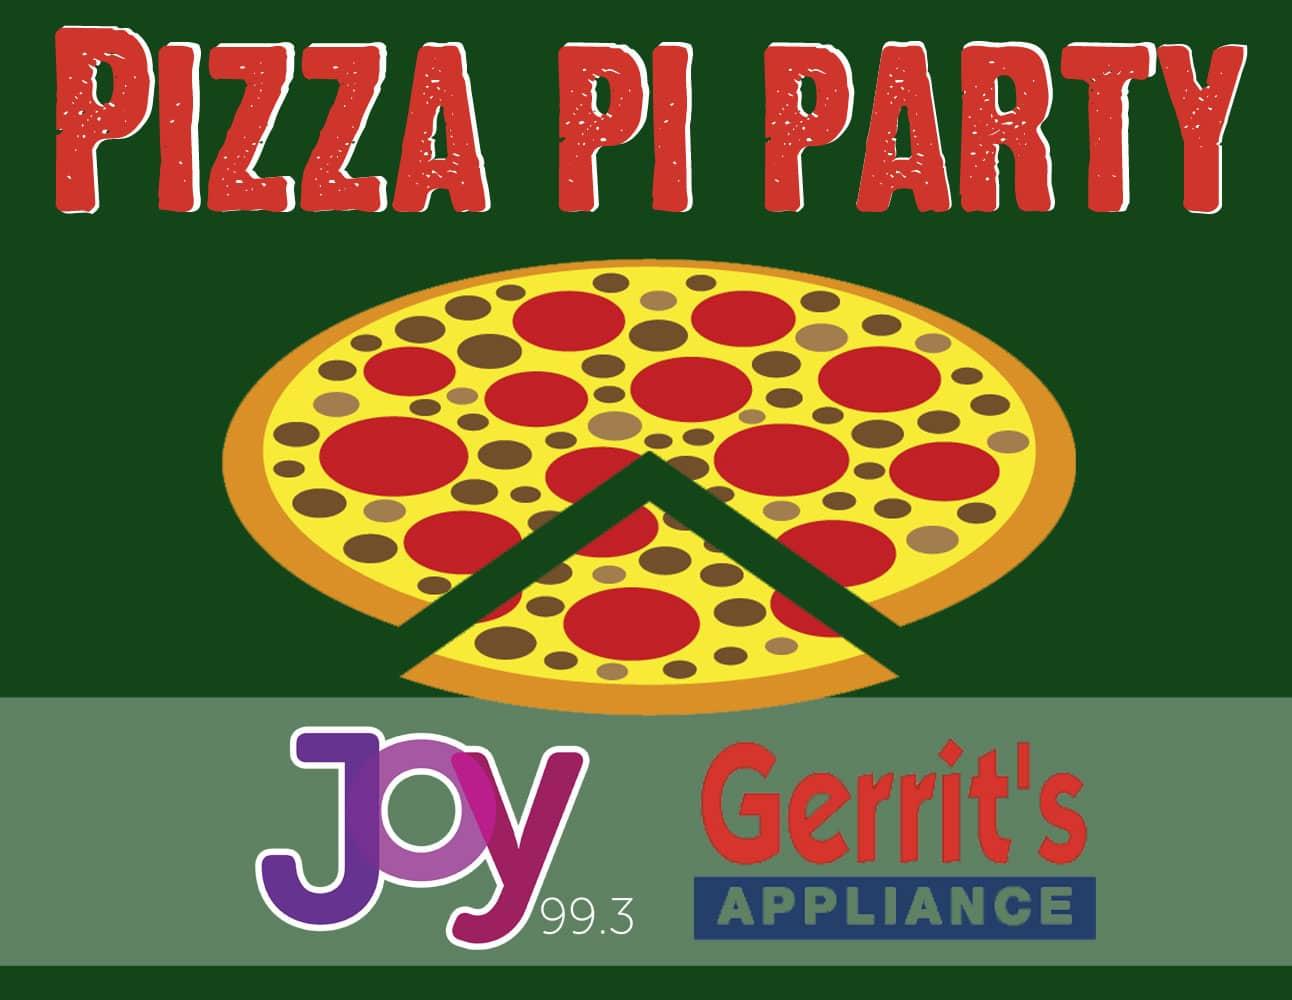 Gerrit's Appliance, Pizza 'Pi' Party!